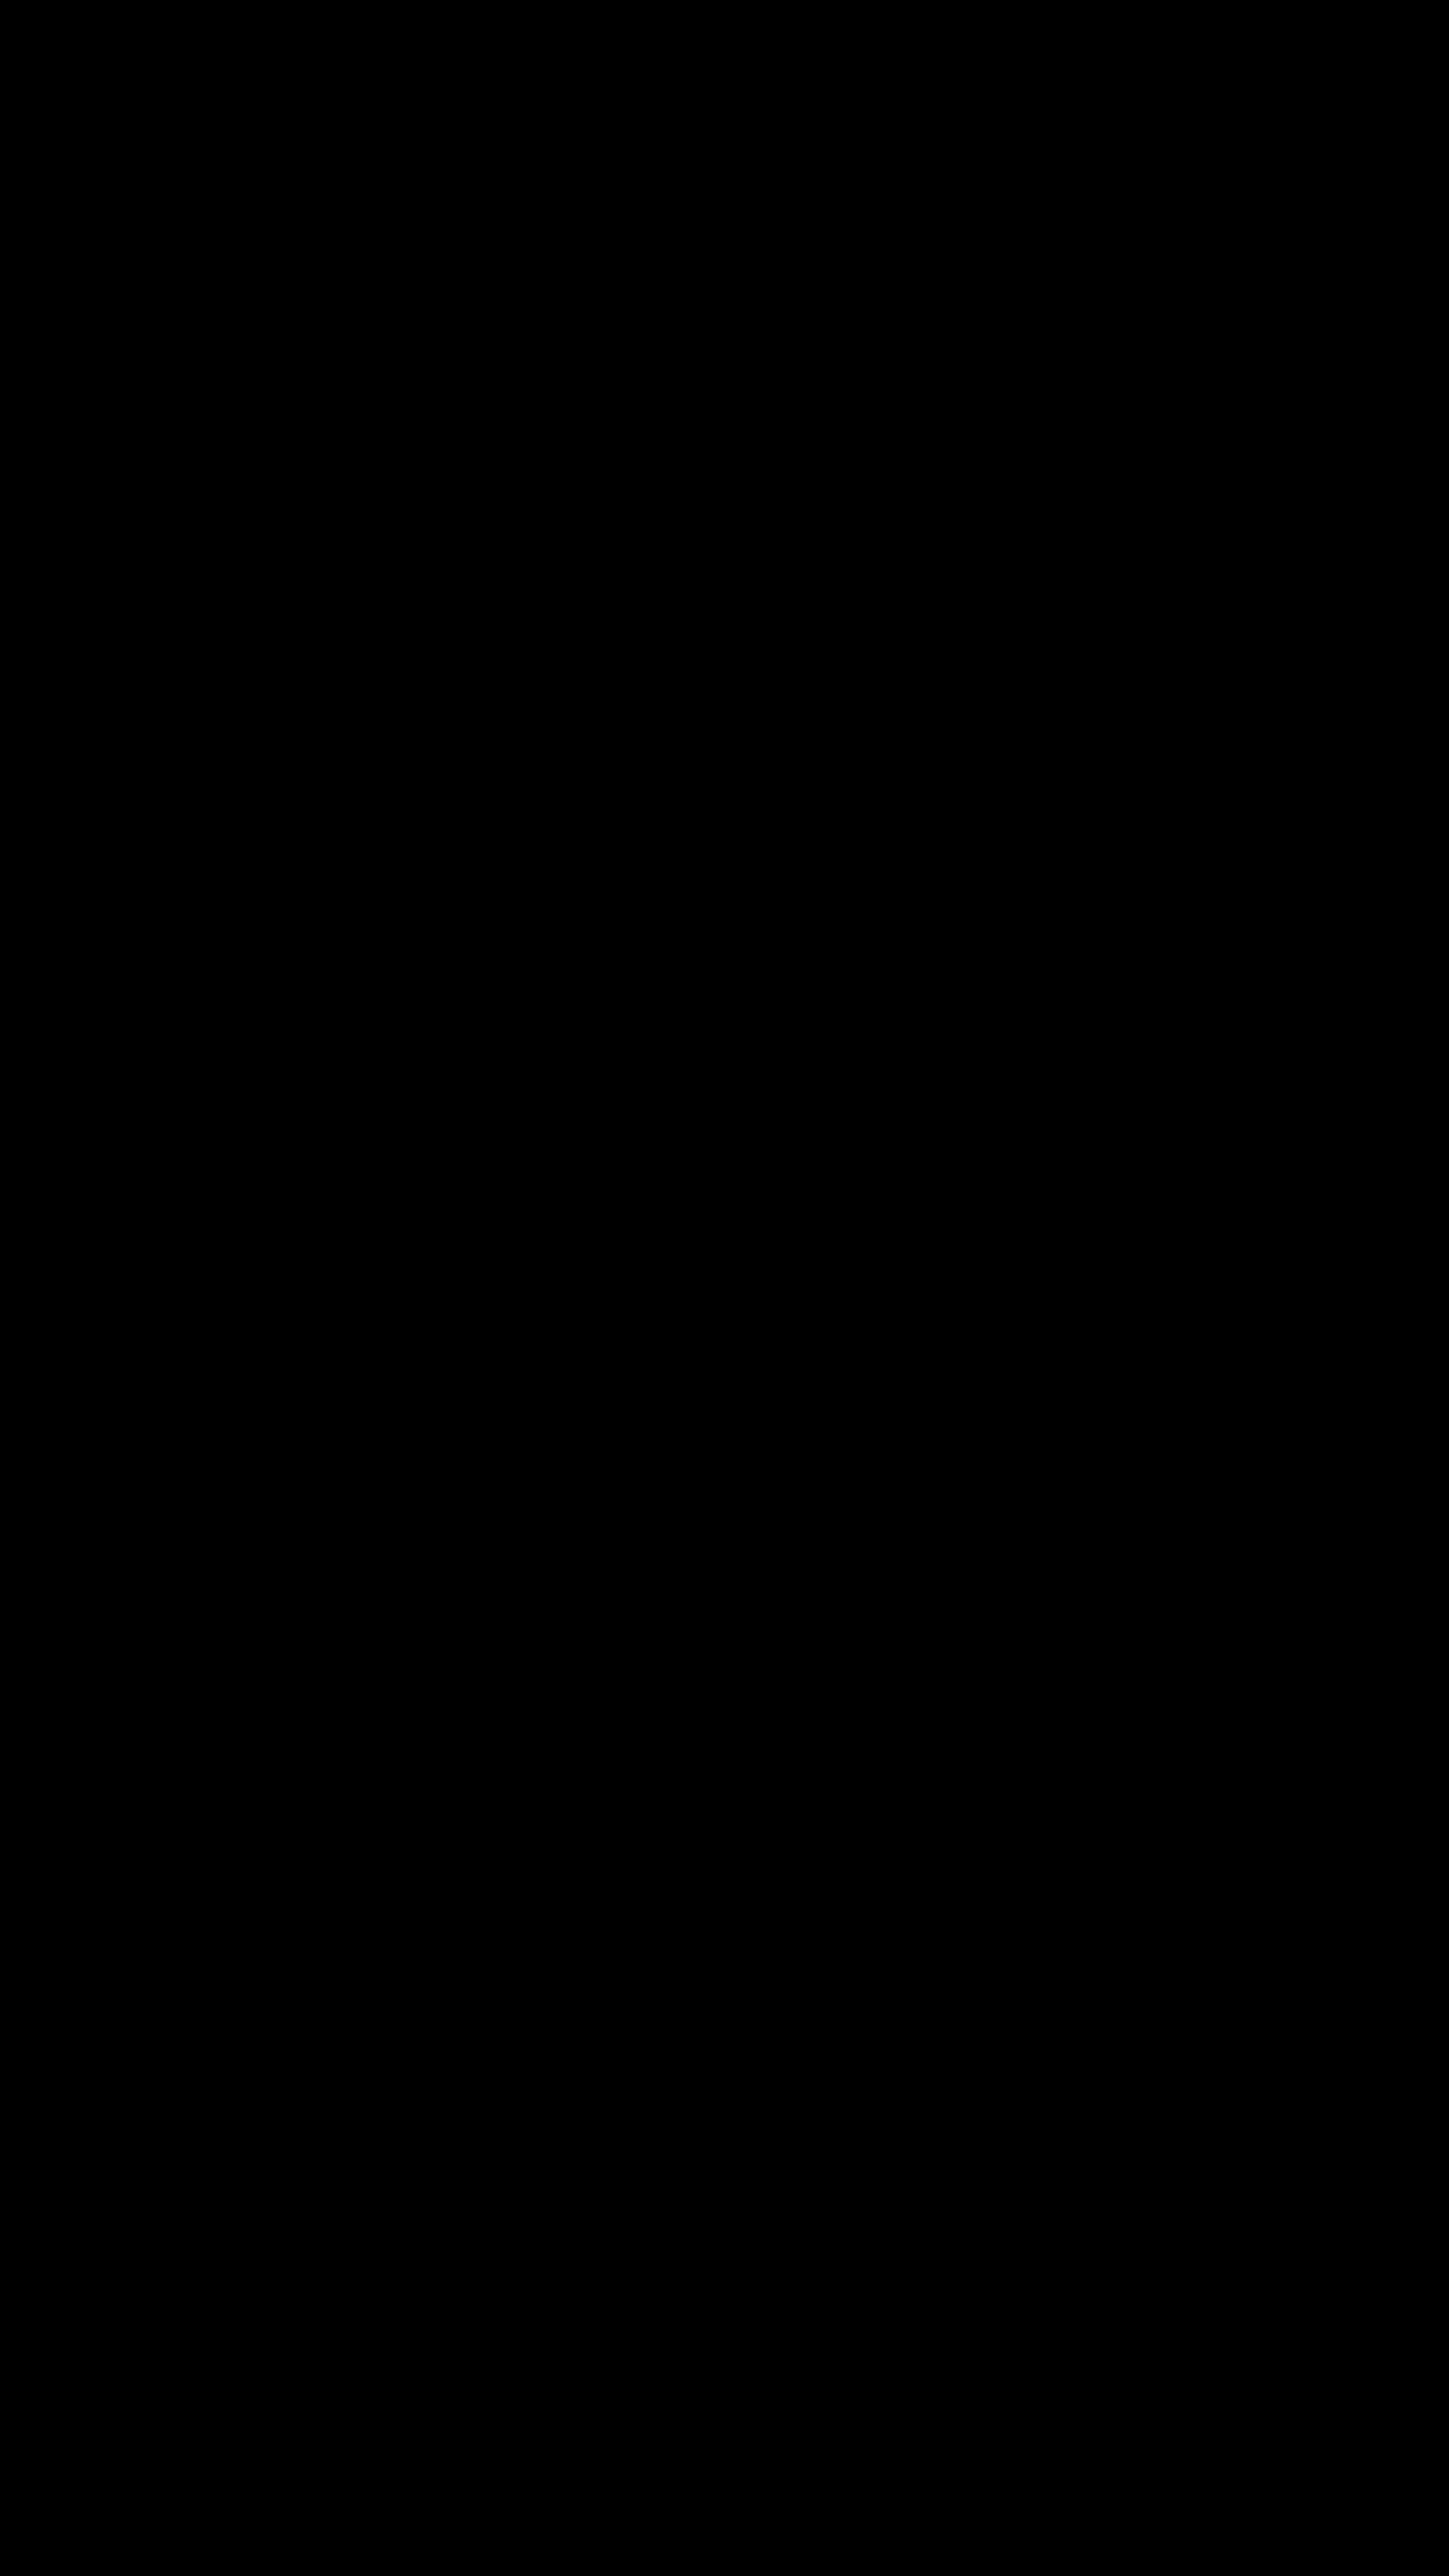 James kveður Halastjörnuna